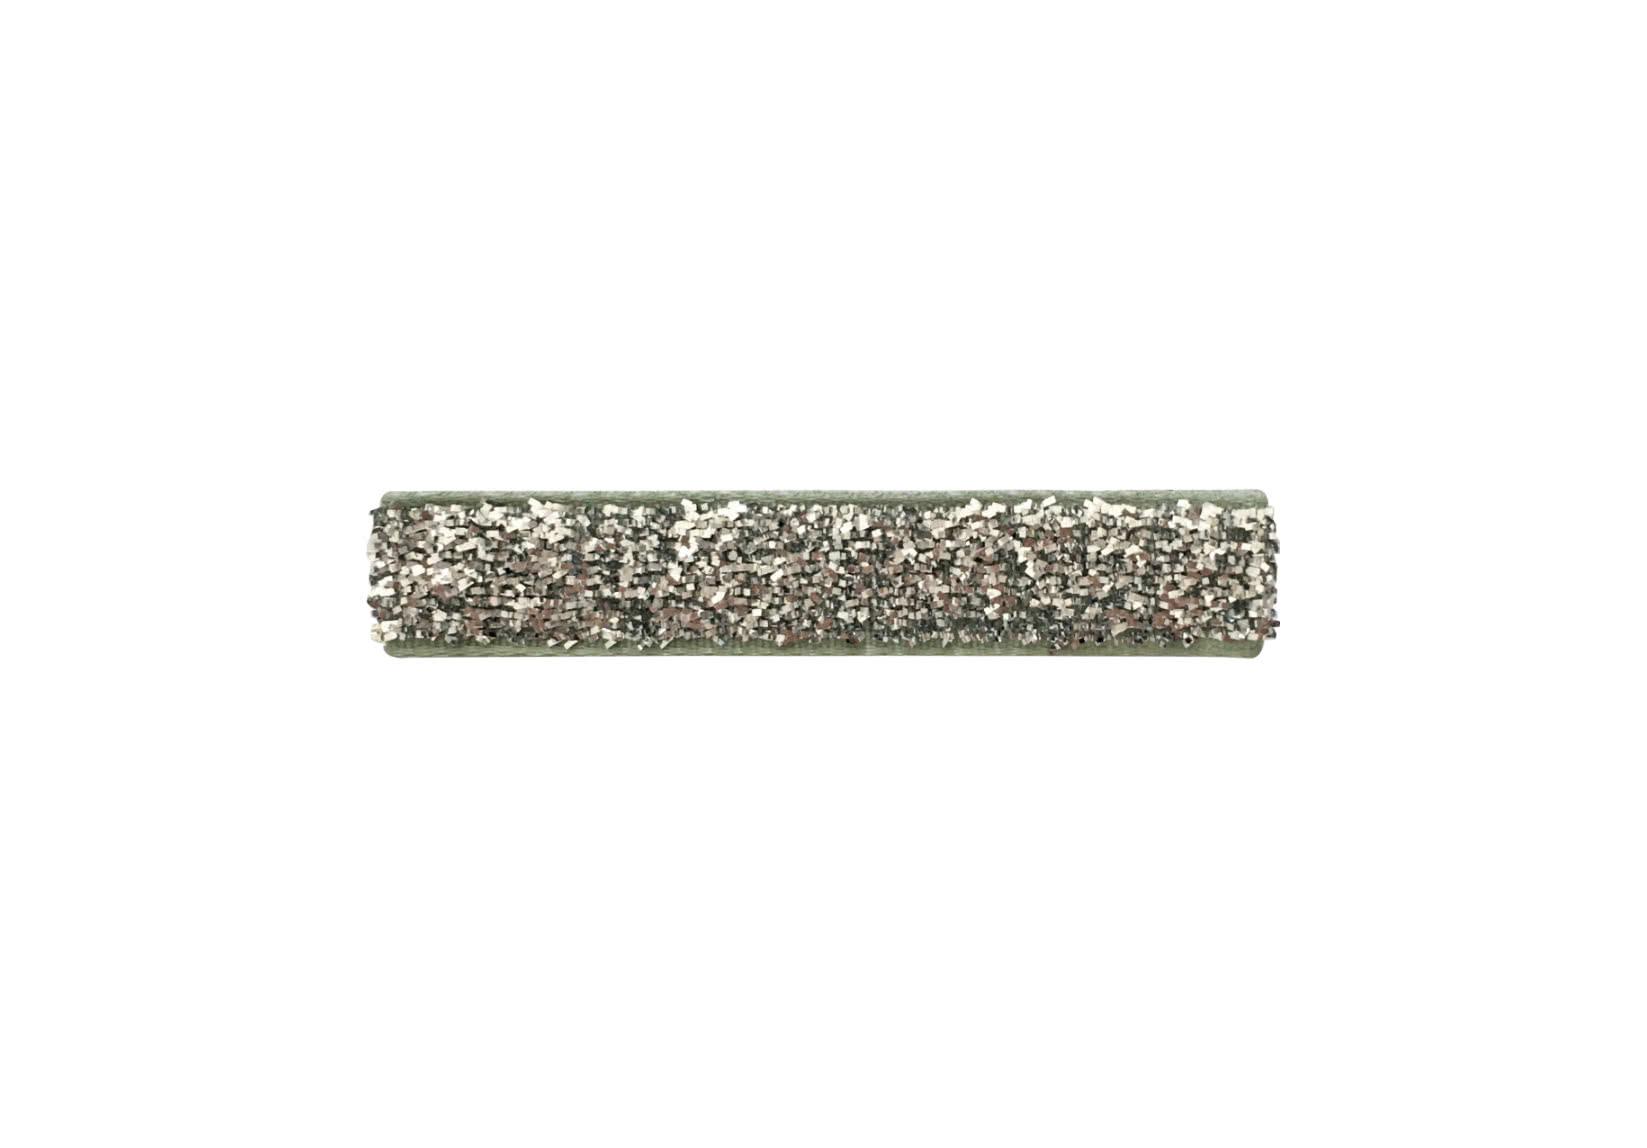 Medium Glitter Covered Alligator Clip – Glitter Collection